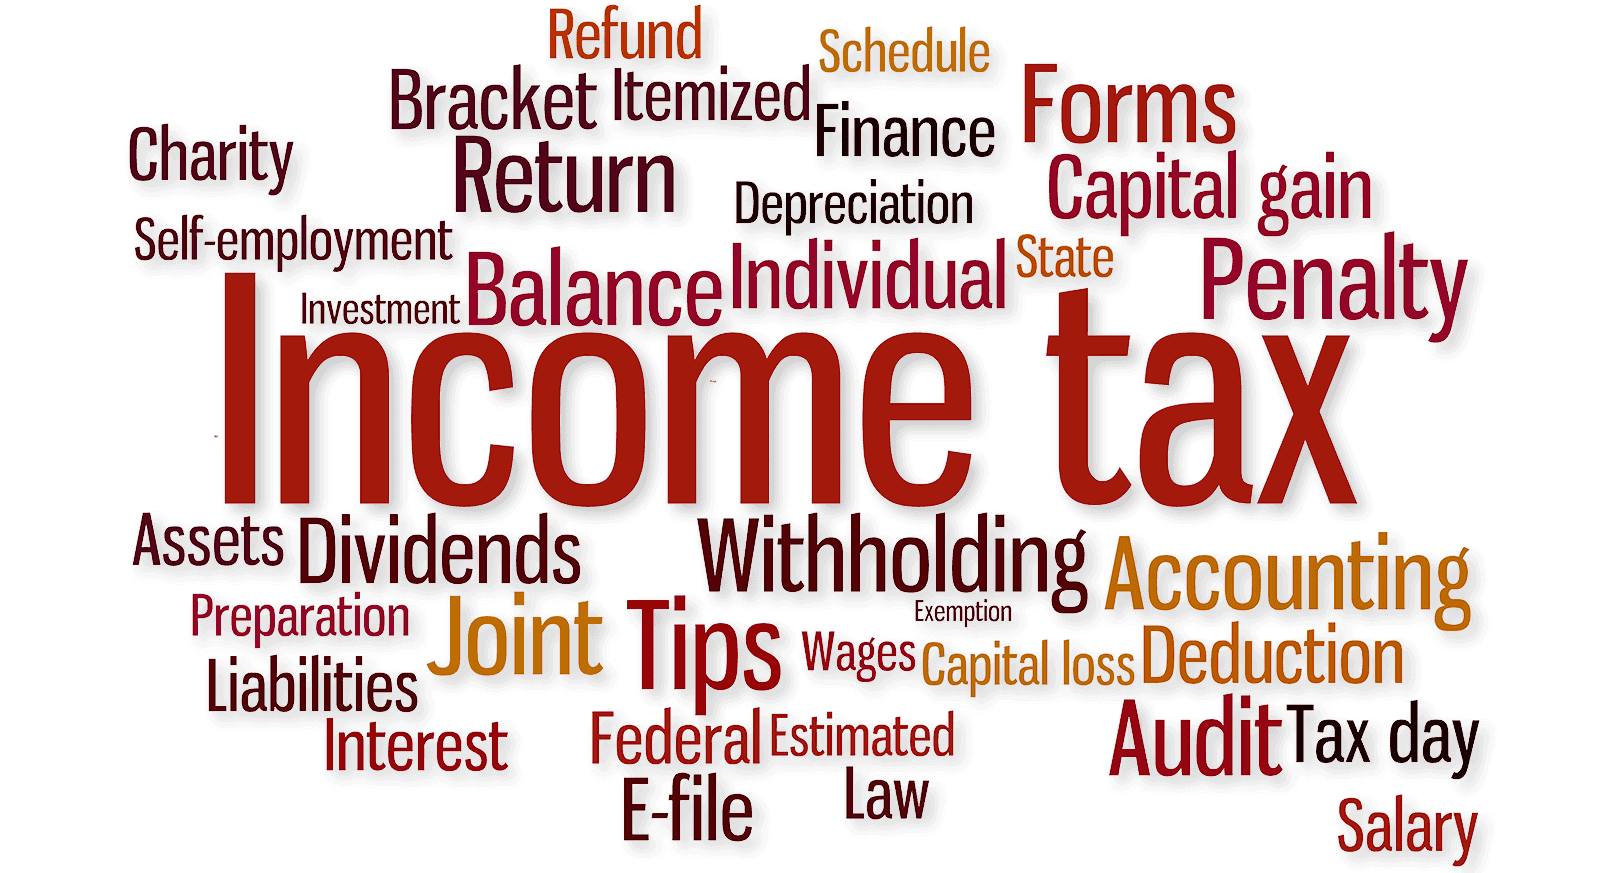 Harbor Tax Service LLC image 7